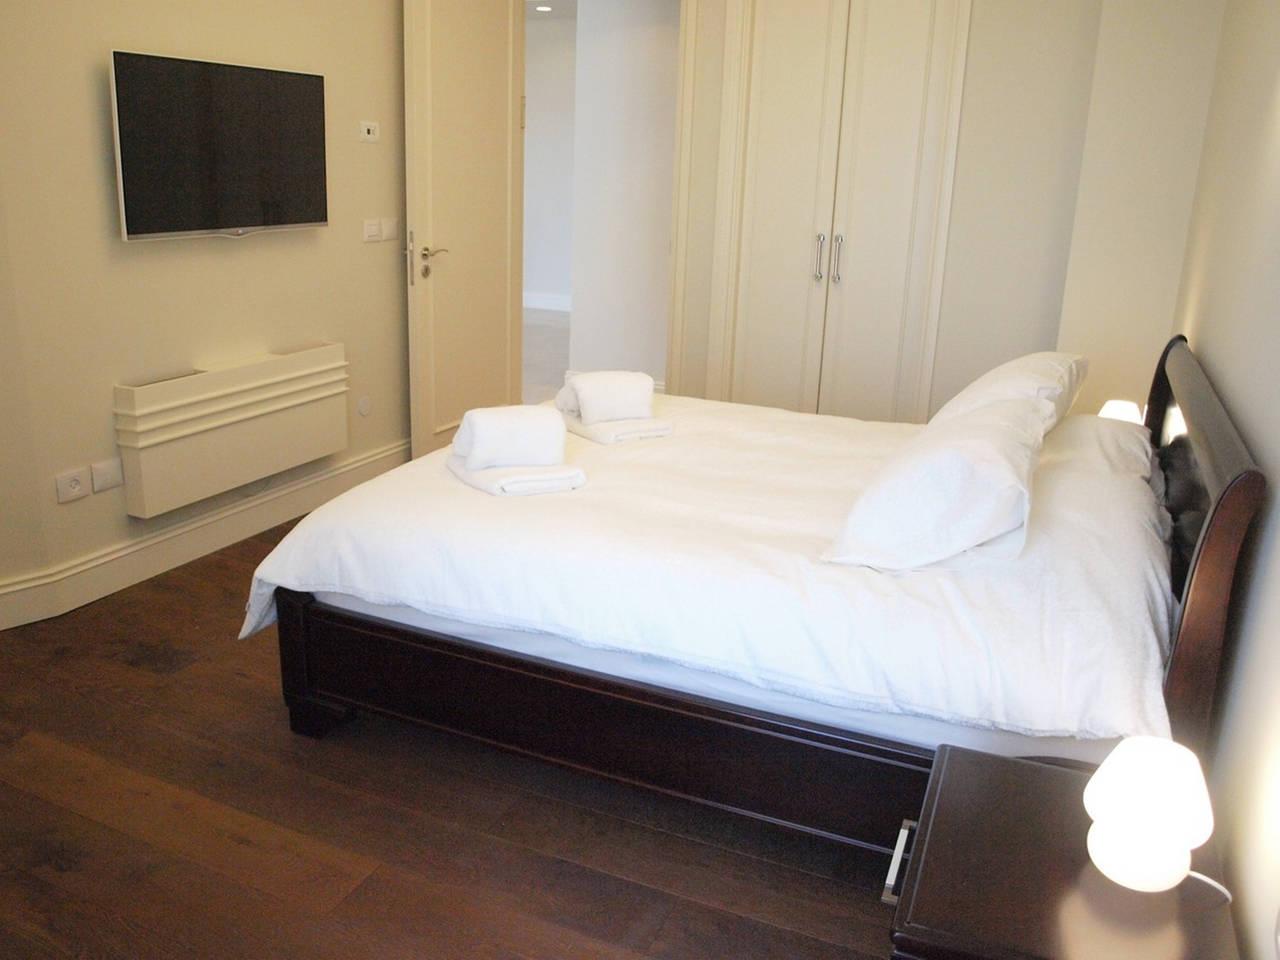 Apartment Great Location - Mamilla Mall Super Luxurious Flat photo 16587120